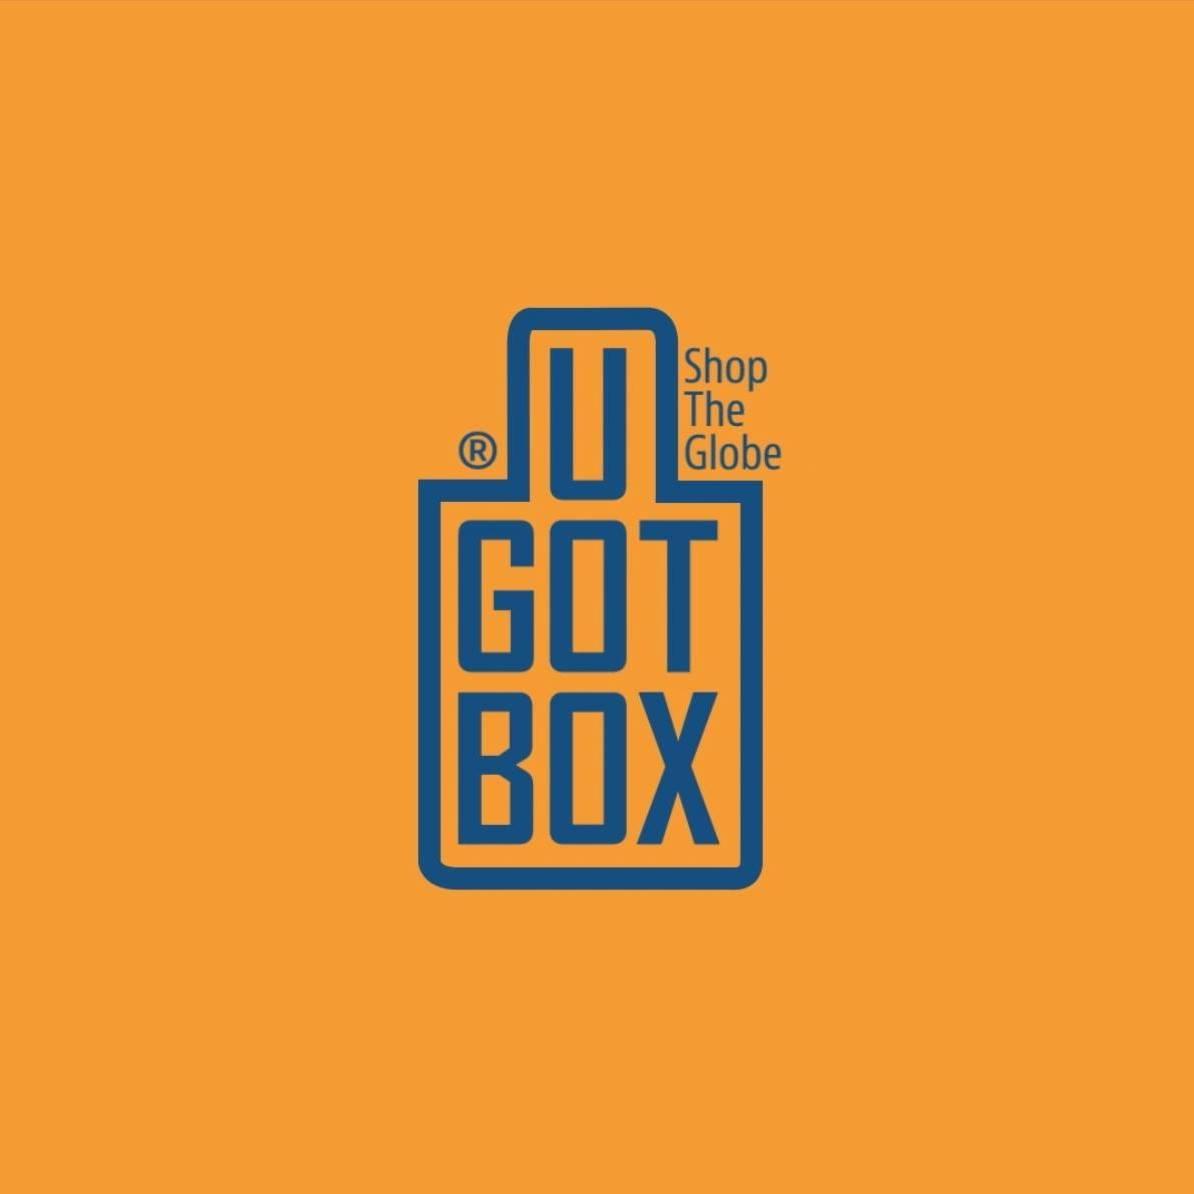 يو جوت بوكس U Got Box